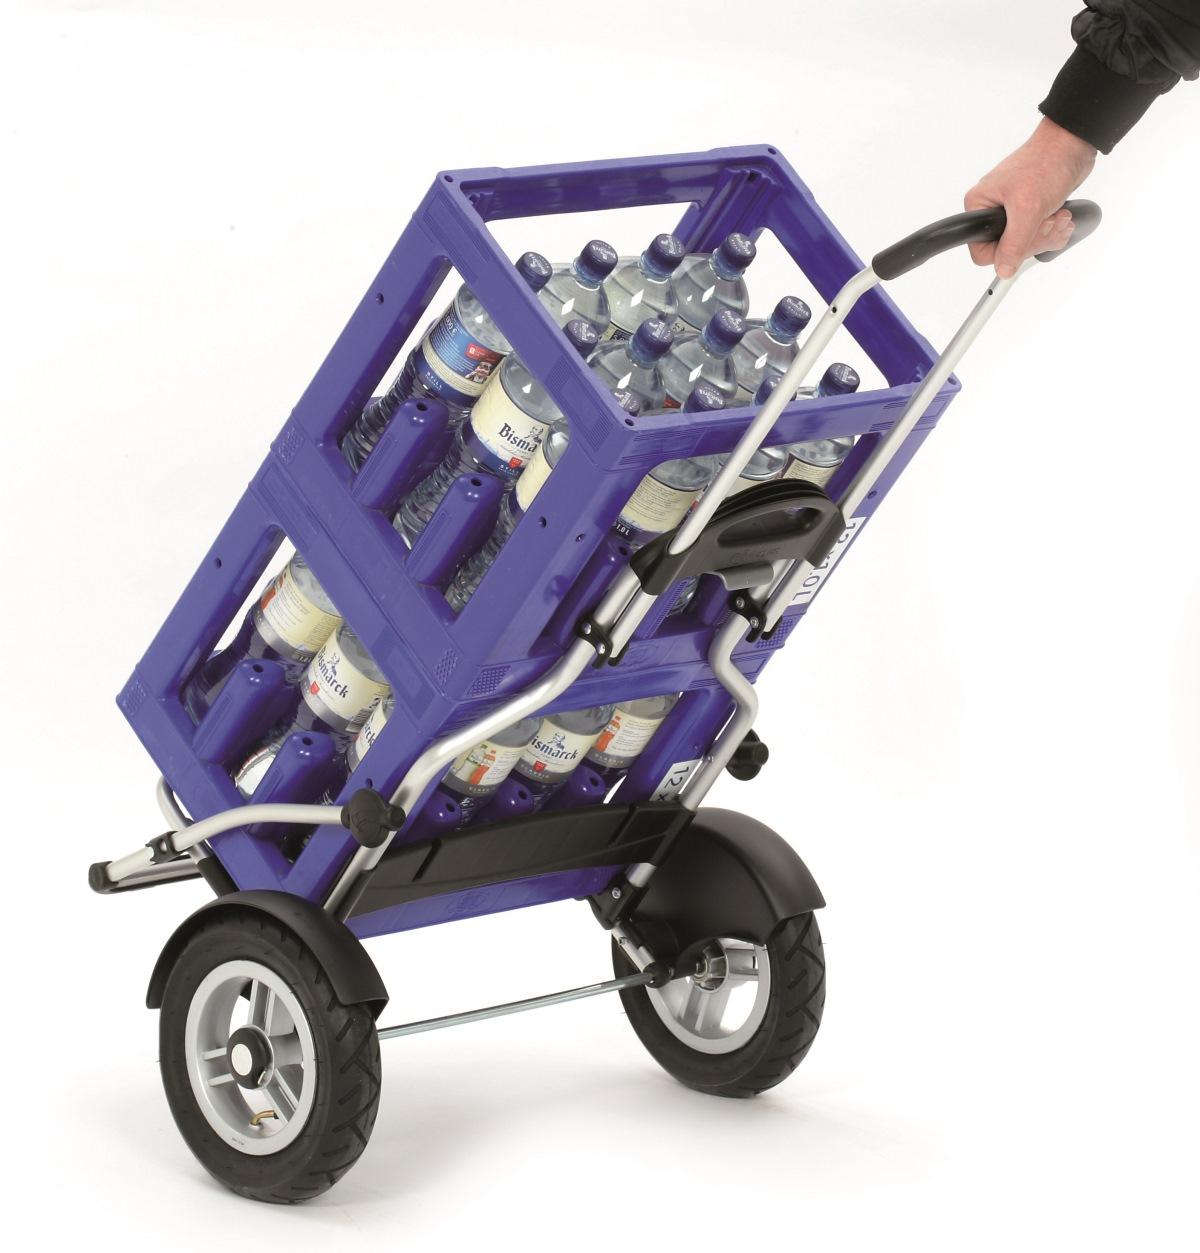 andersen royal shopper plus gestell aus alu fahrrad anh nger einkaufs trolley. Black Bedroom Furniture Sets. Home Design Ideas